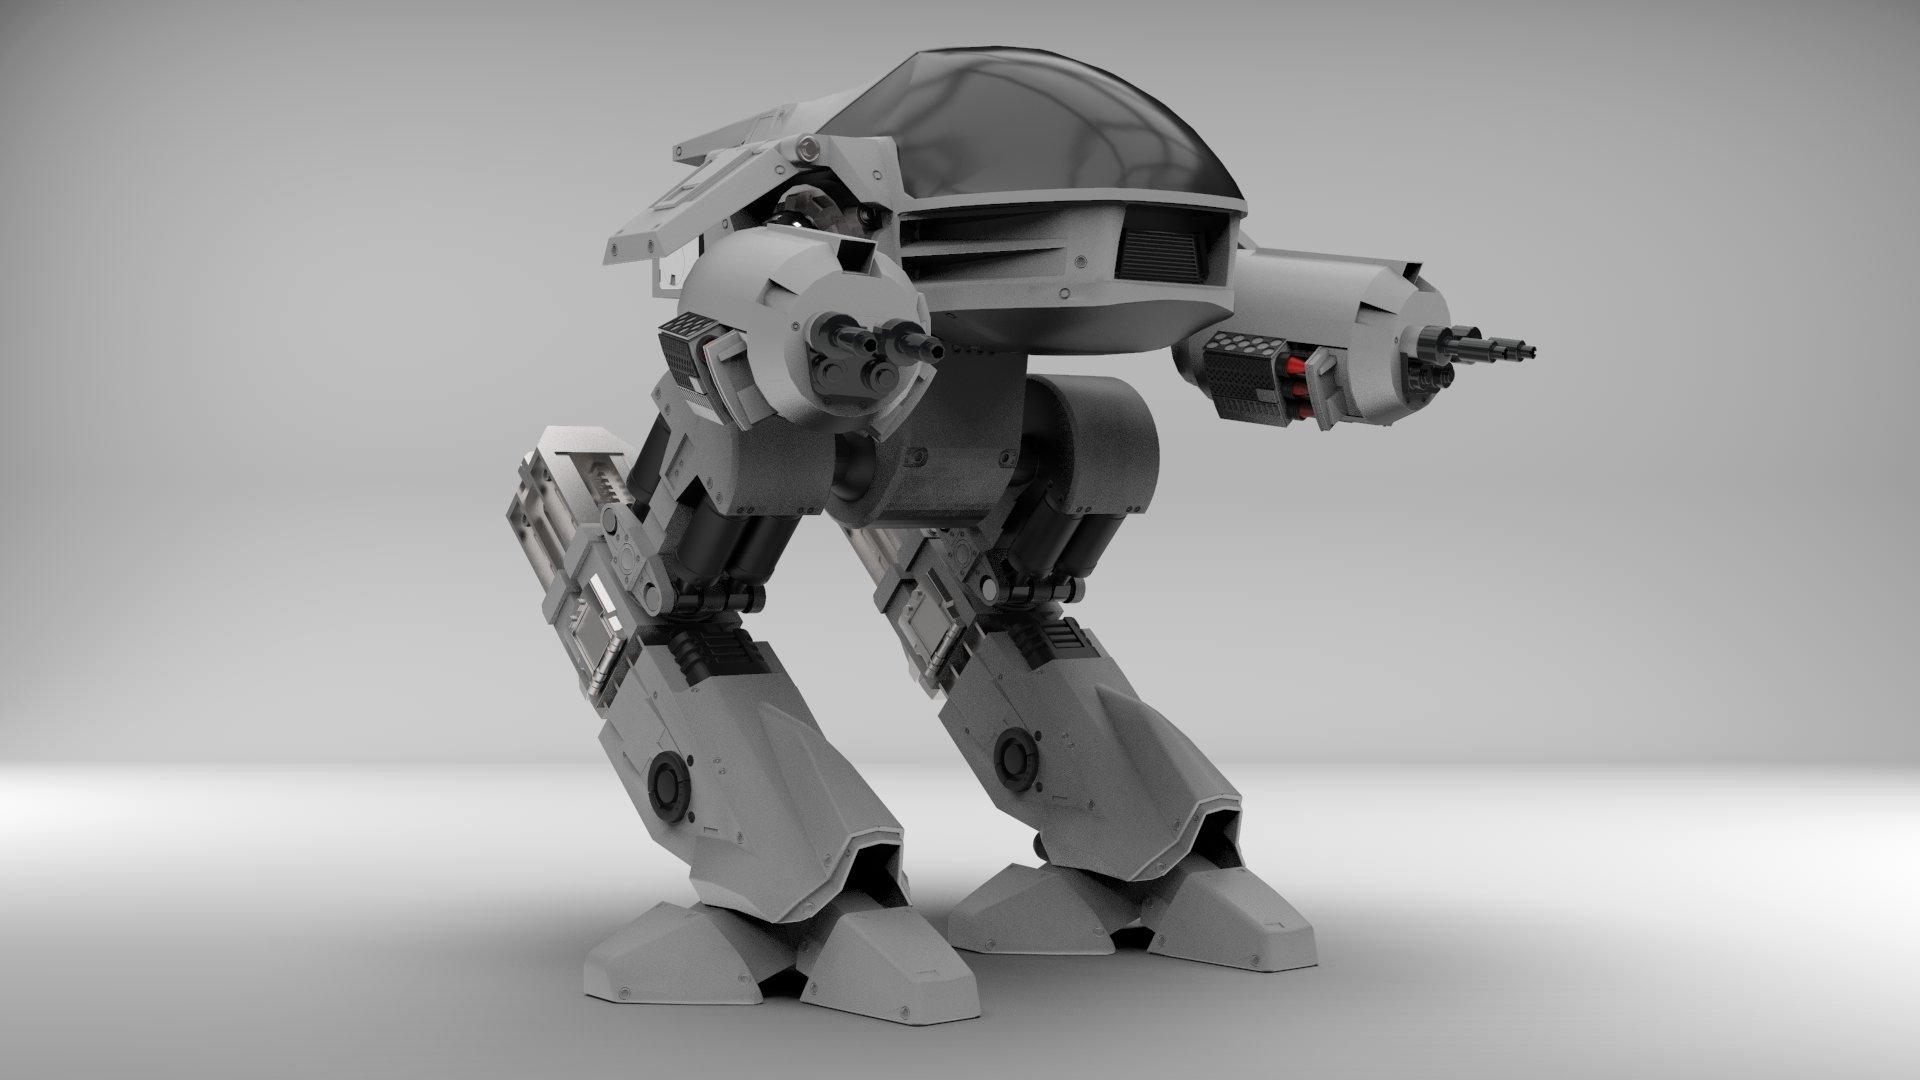 Robocop's ED209 Police Robot 00002